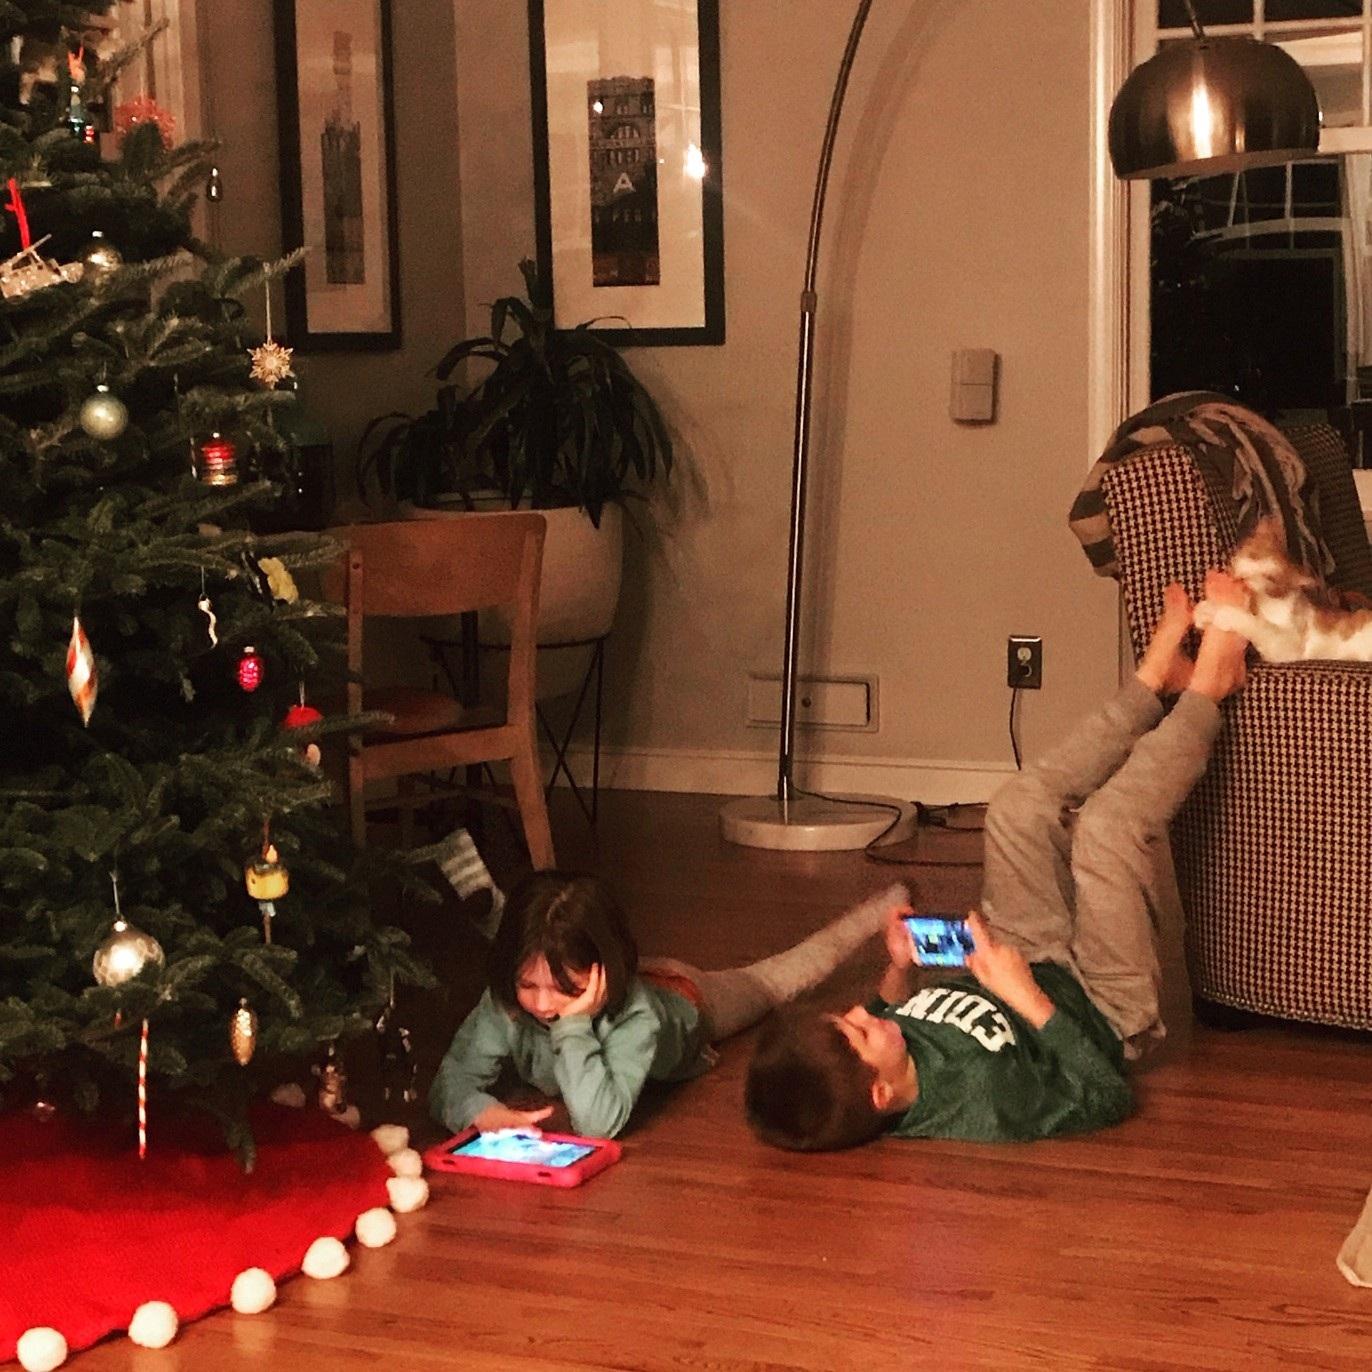 kids on floor.jpg